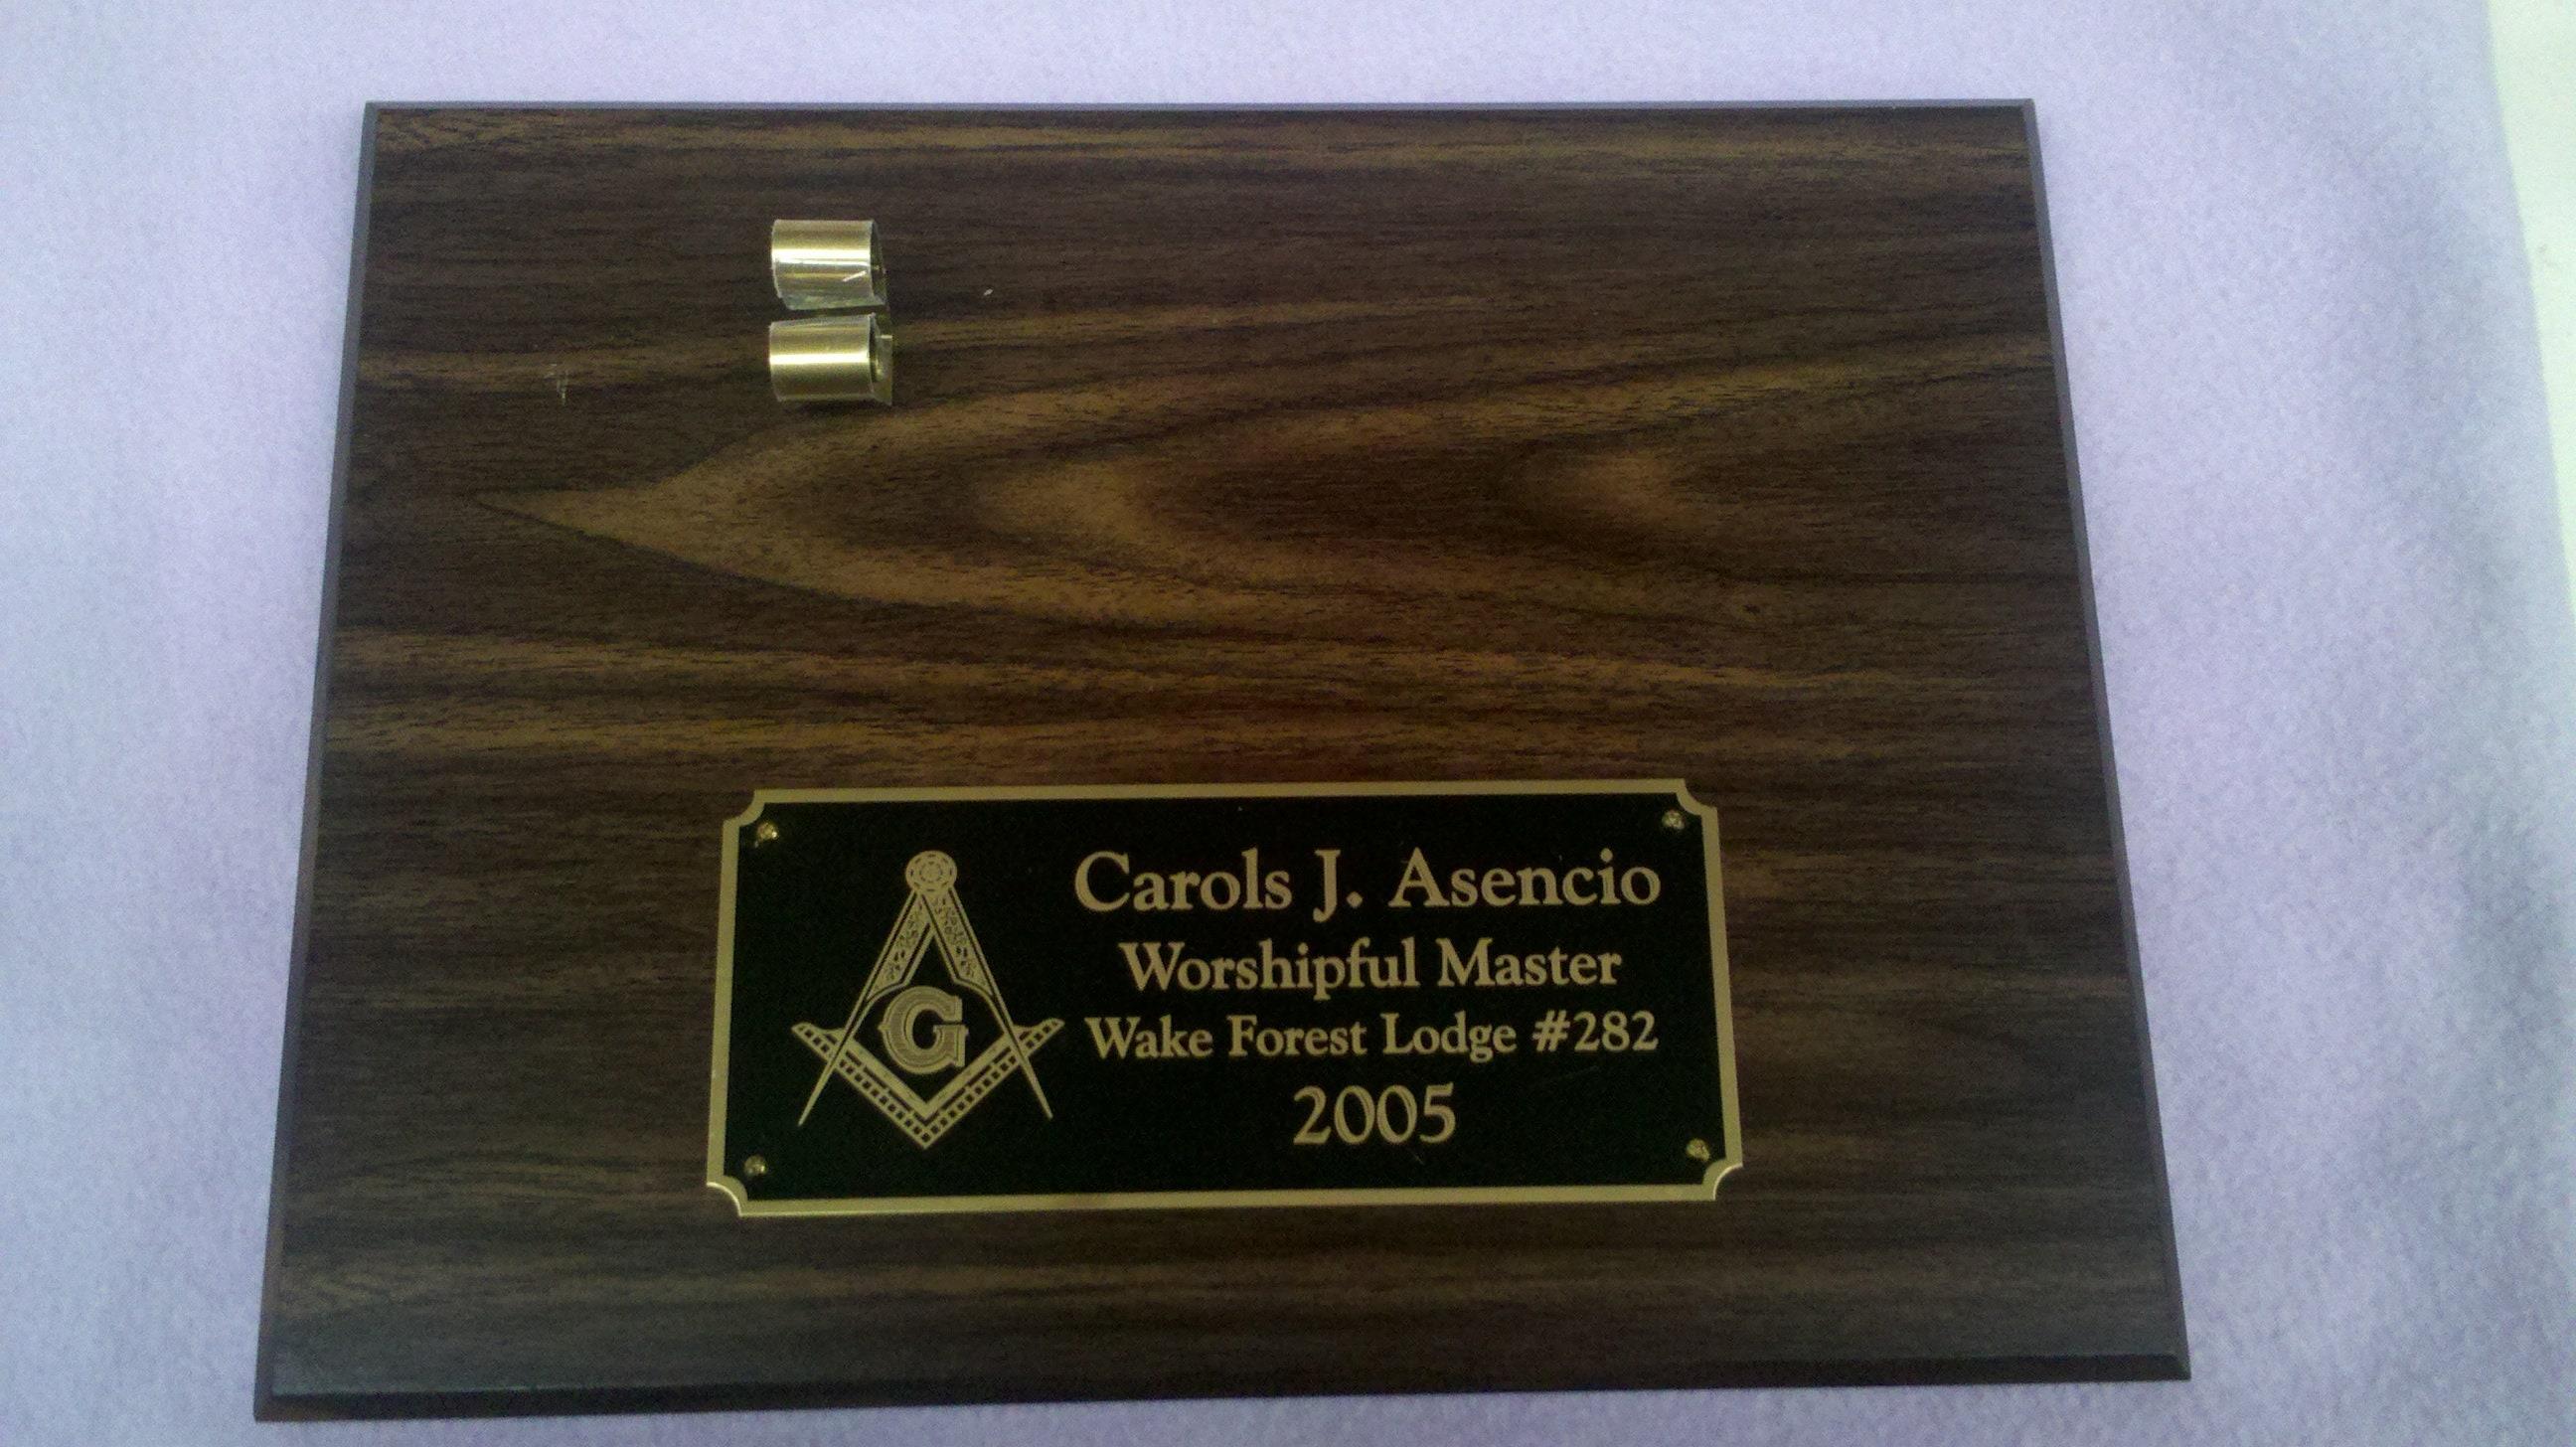 Masonic Walnut Finish Personalized 9 x 12 Plaque with Gavel